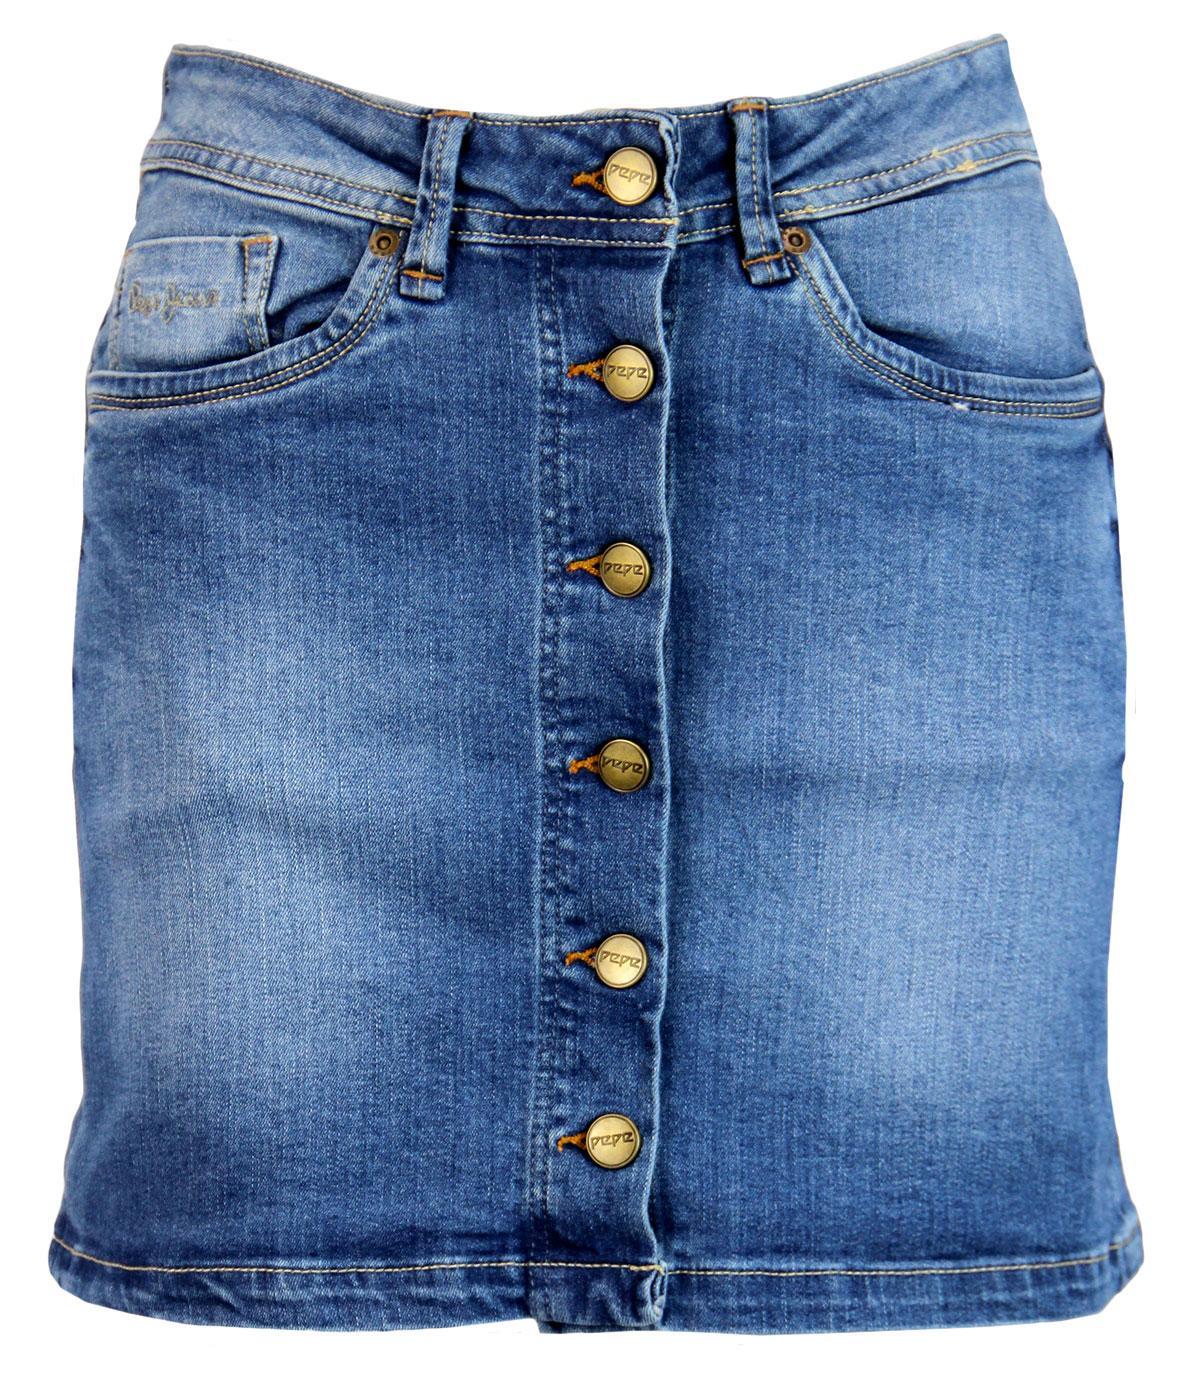 Khloe PEPE JEANS Retro Button Front Denim Skirt